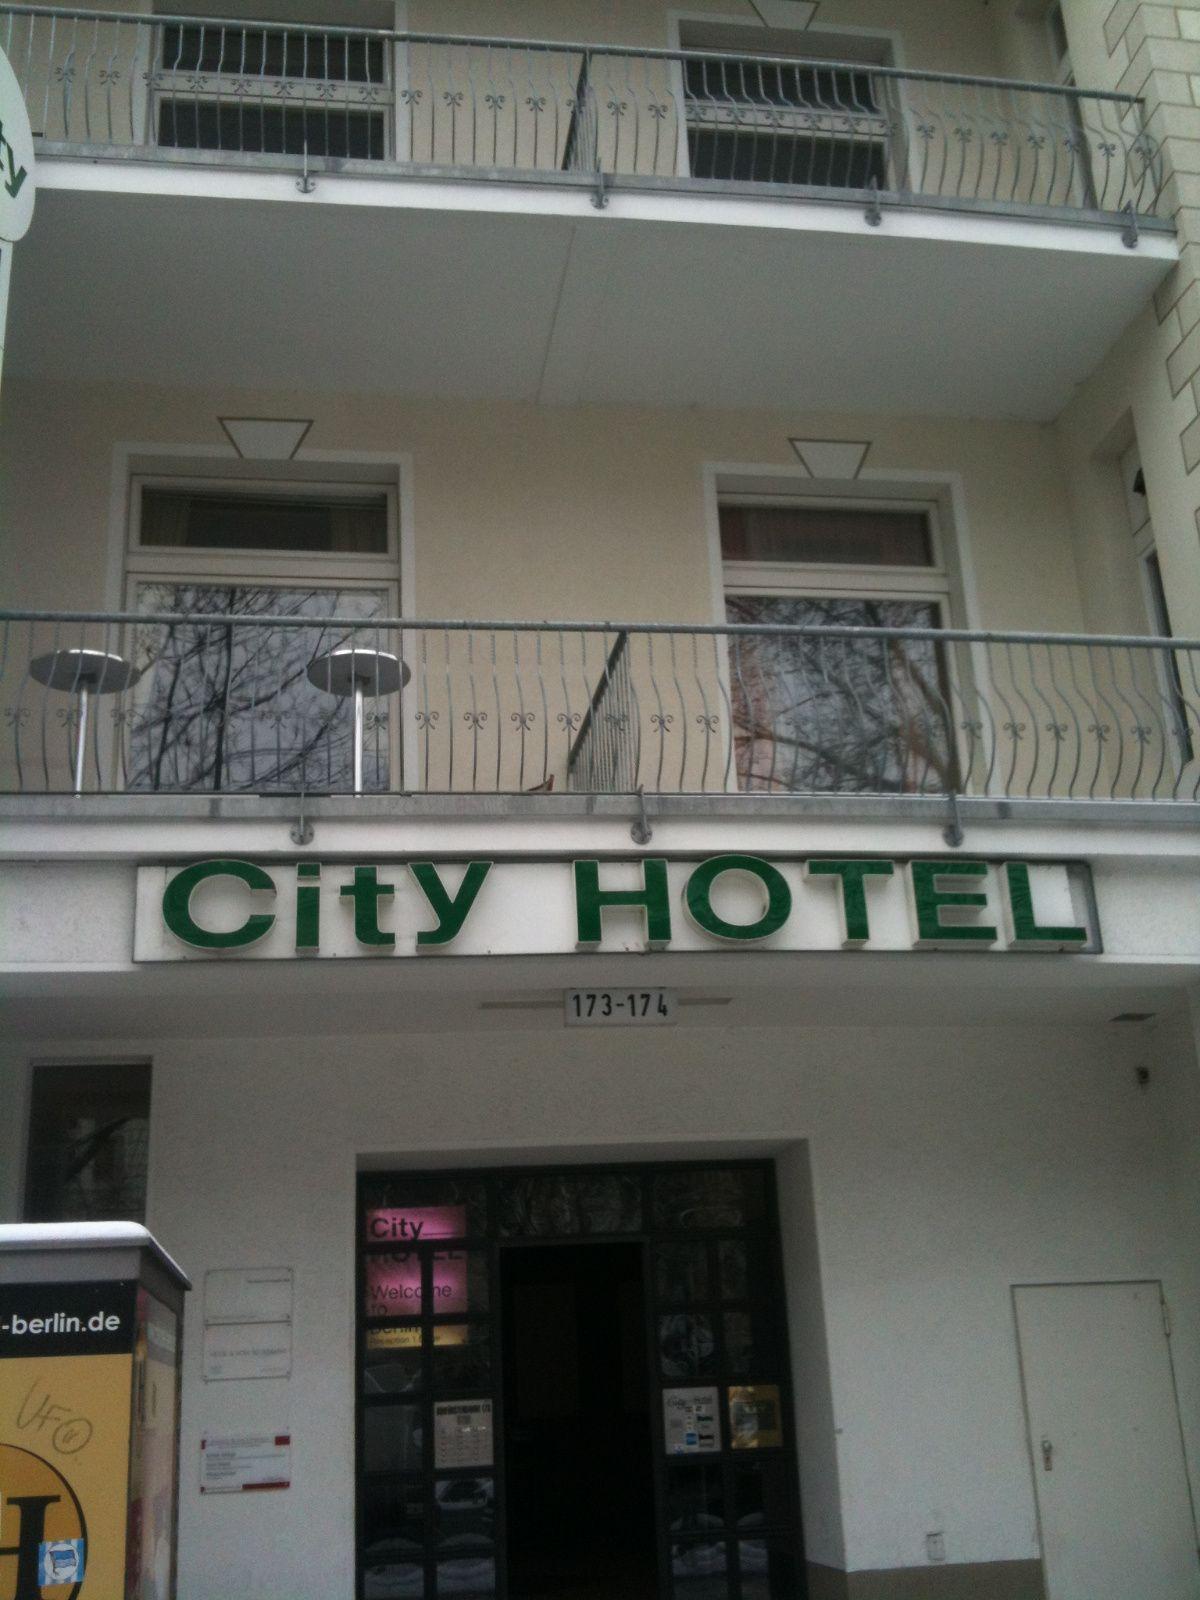 Viešbutis, kuriame apsistojau - City am Kurfurstendamm